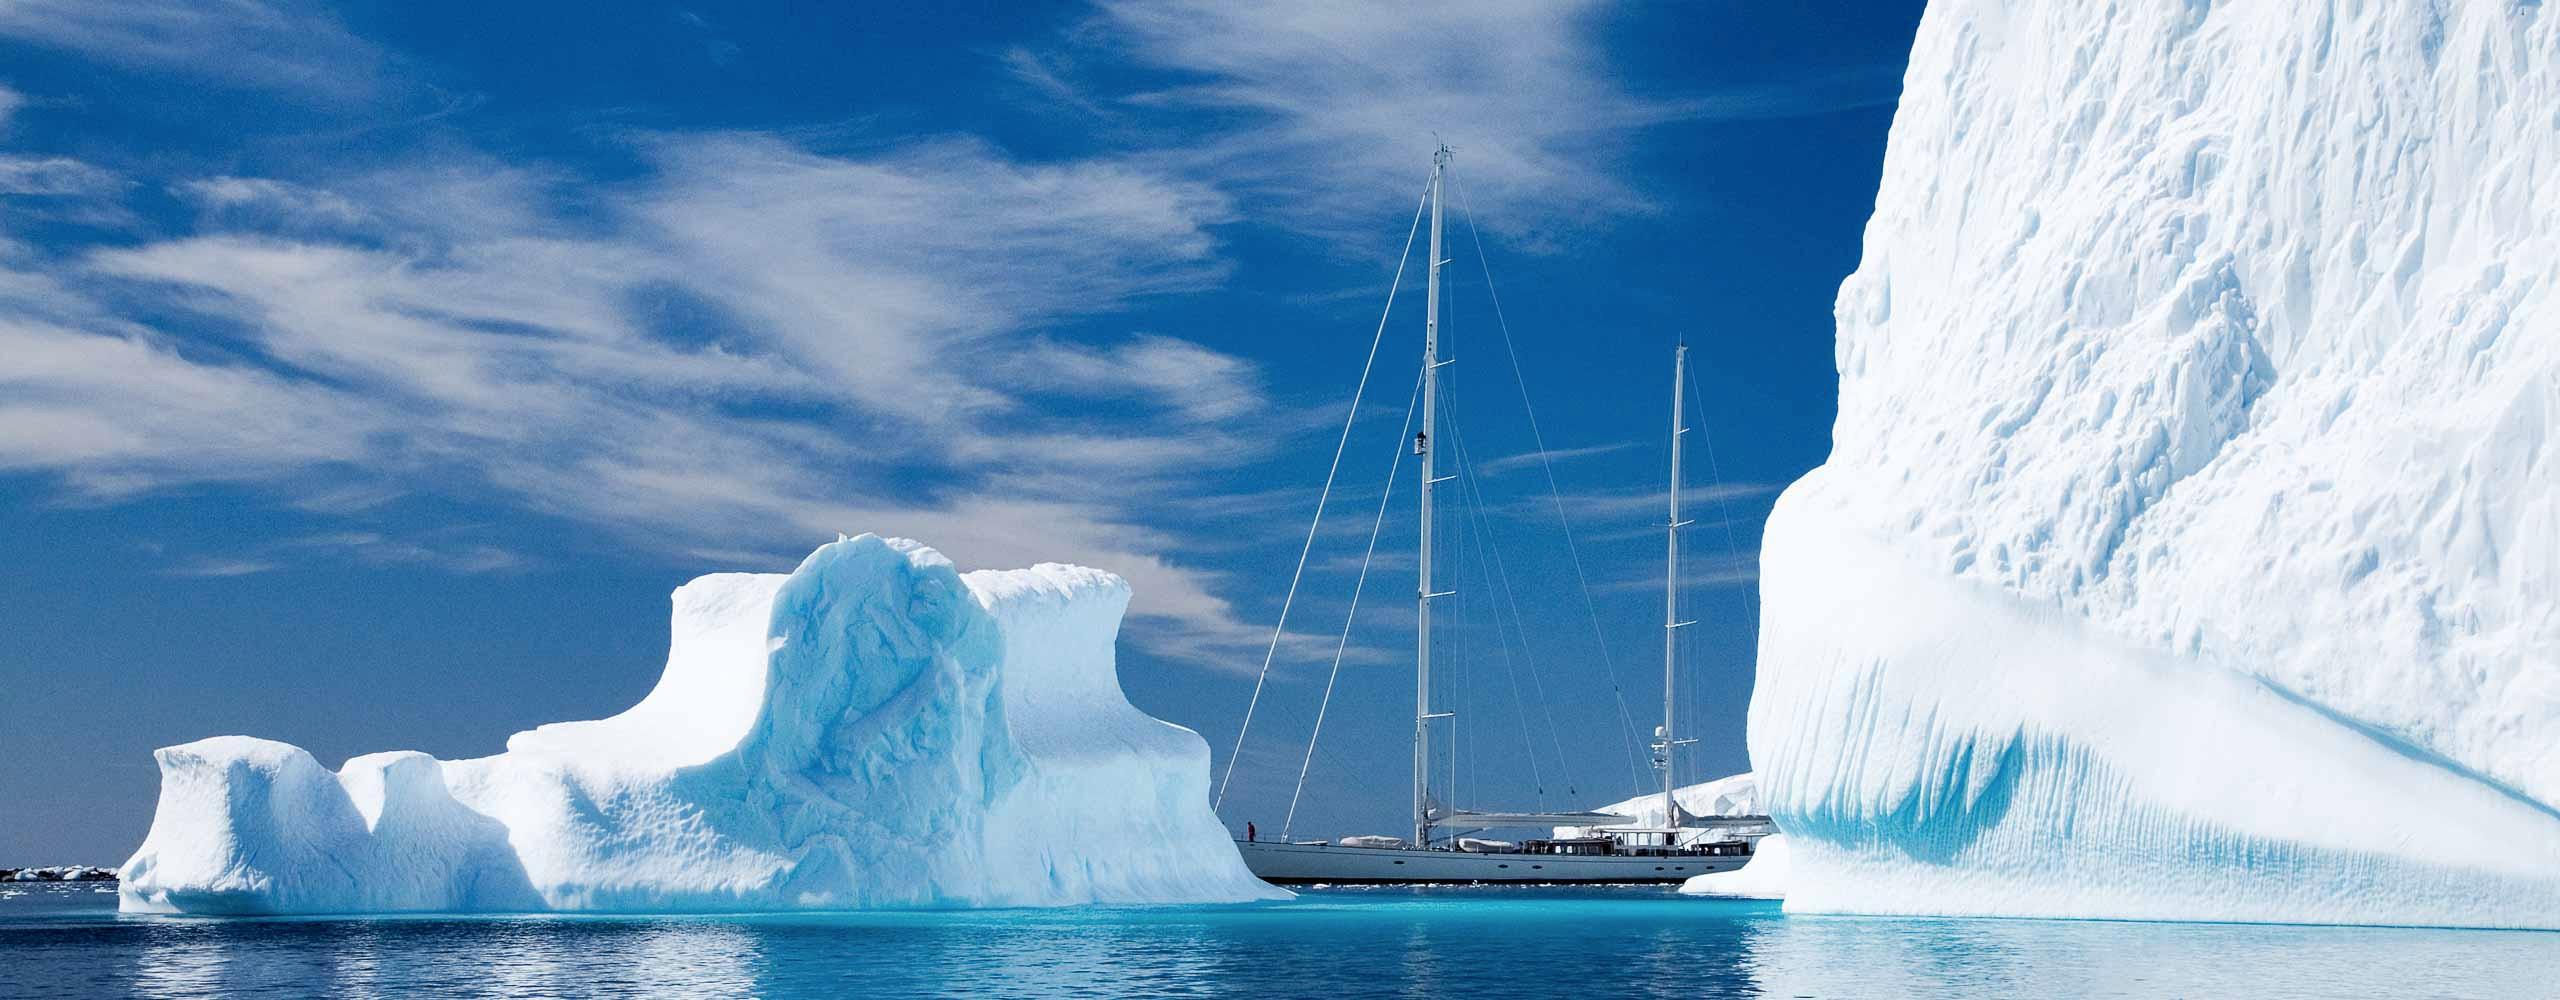 Adèle among icebergs